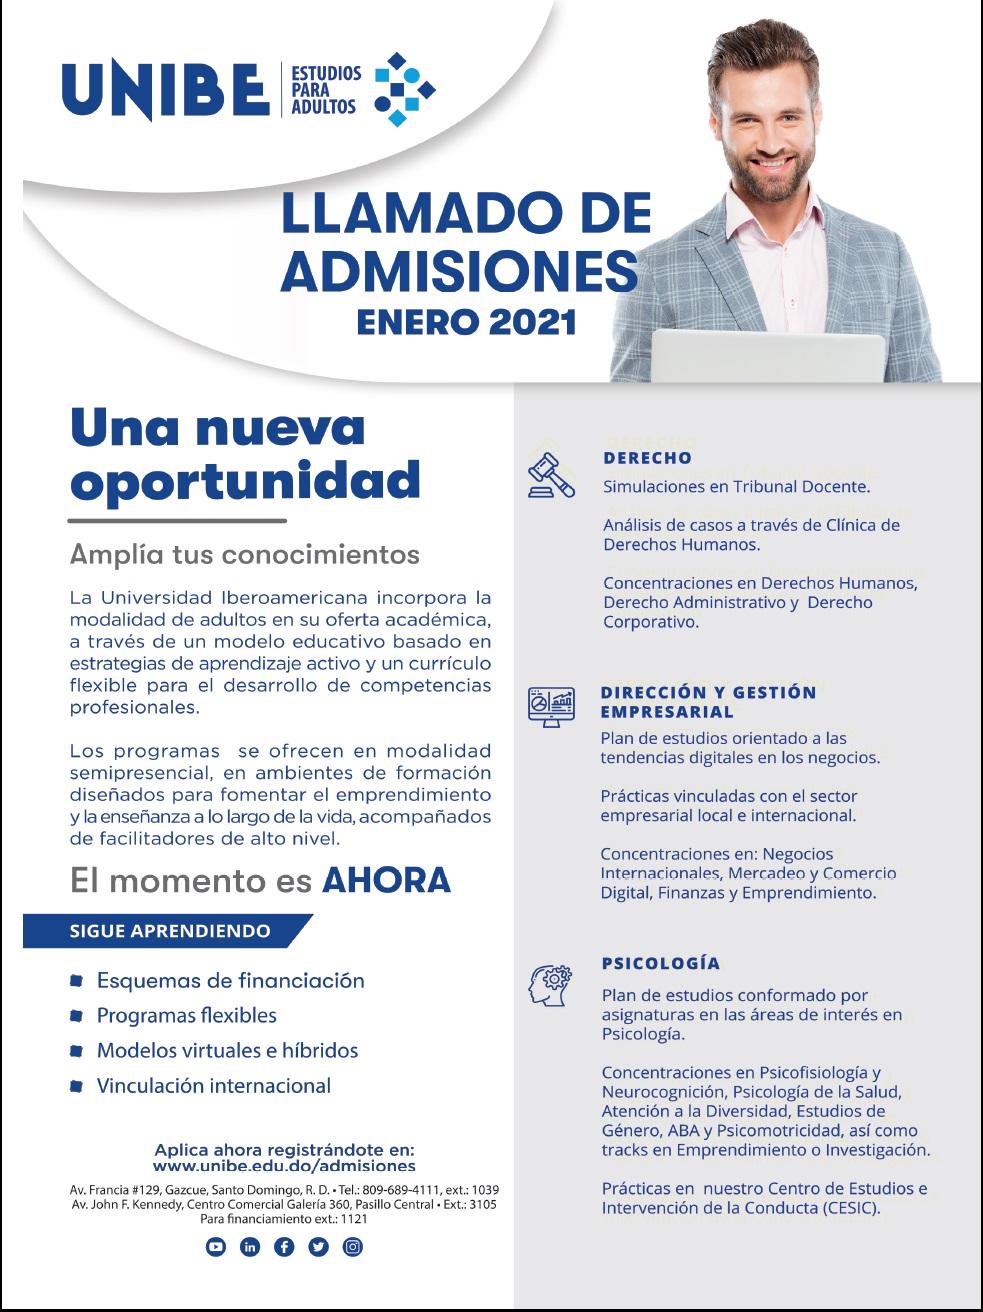 Universidad Iberoamericana en